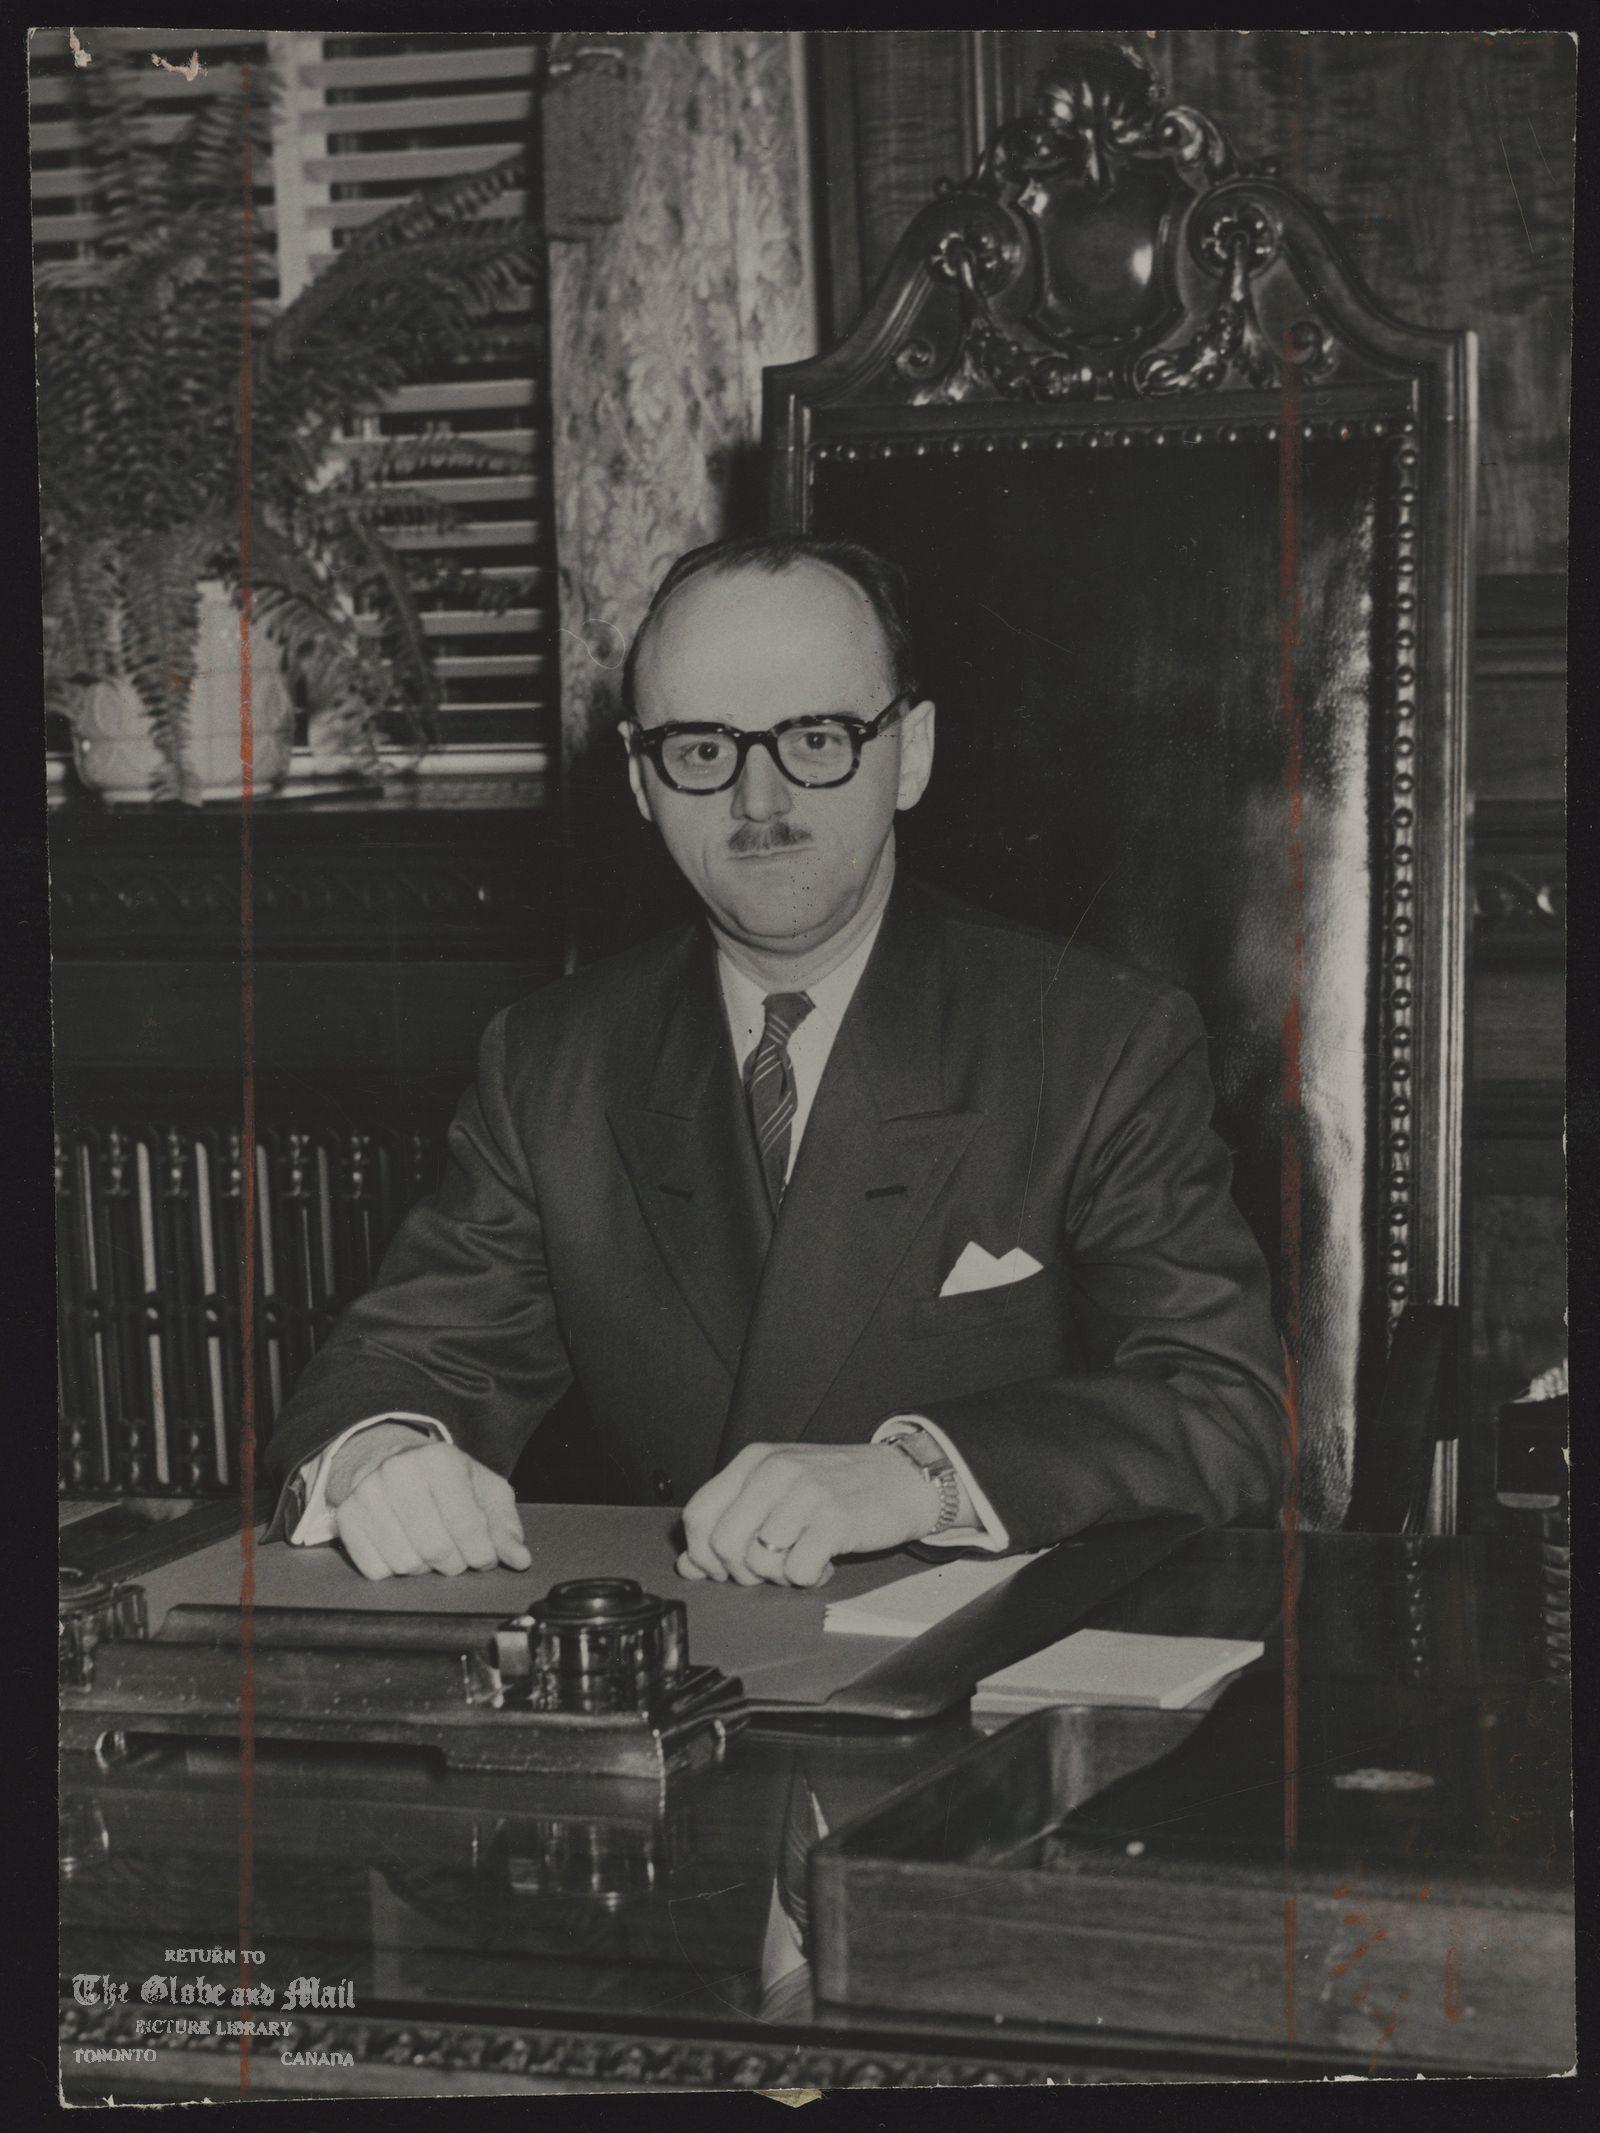 DRAPEAU (Mayor) Jean Montreal